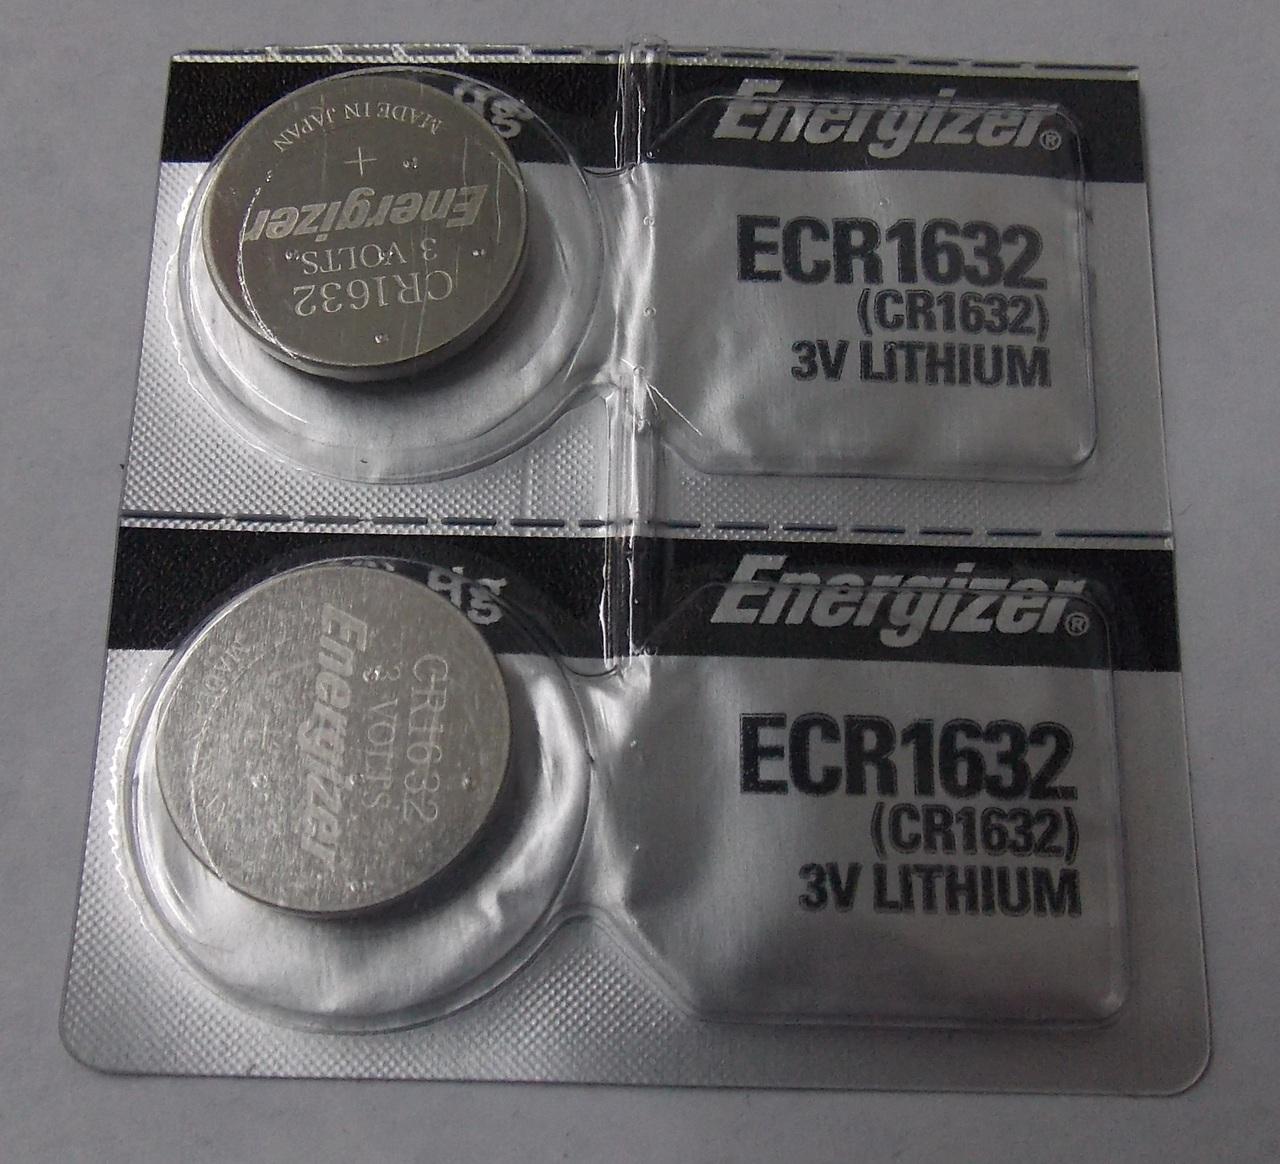 Energizer CR1632 3V Lithium...